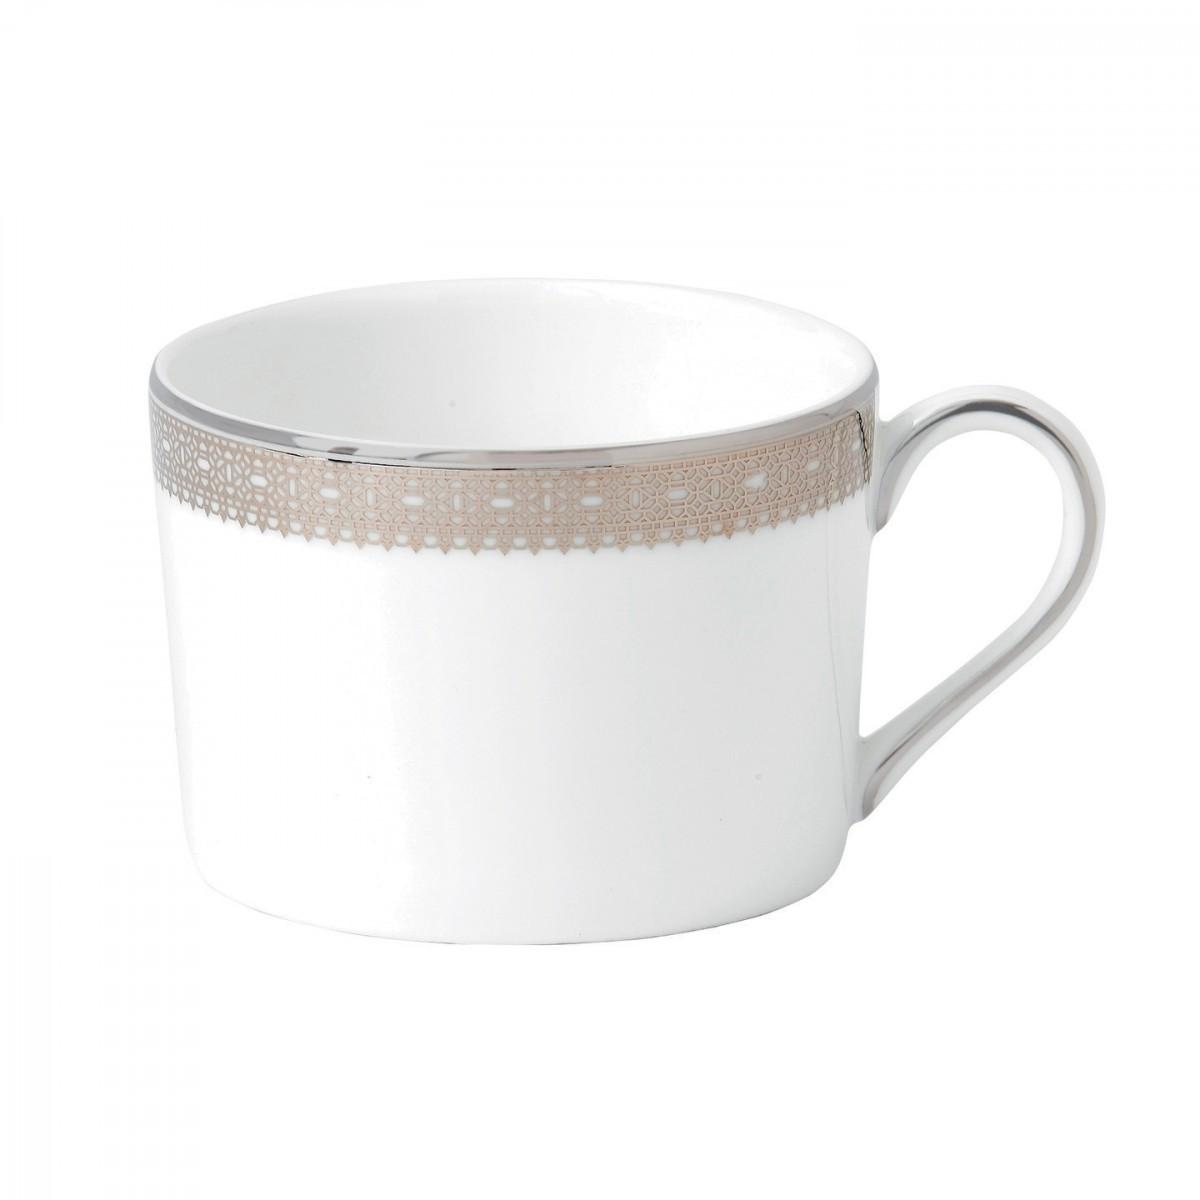 Vera Wang Vase Wedgwood Of Vera Lace Teacup Vera Wang Wedgwood Us Regarding Vera Lace Teacup